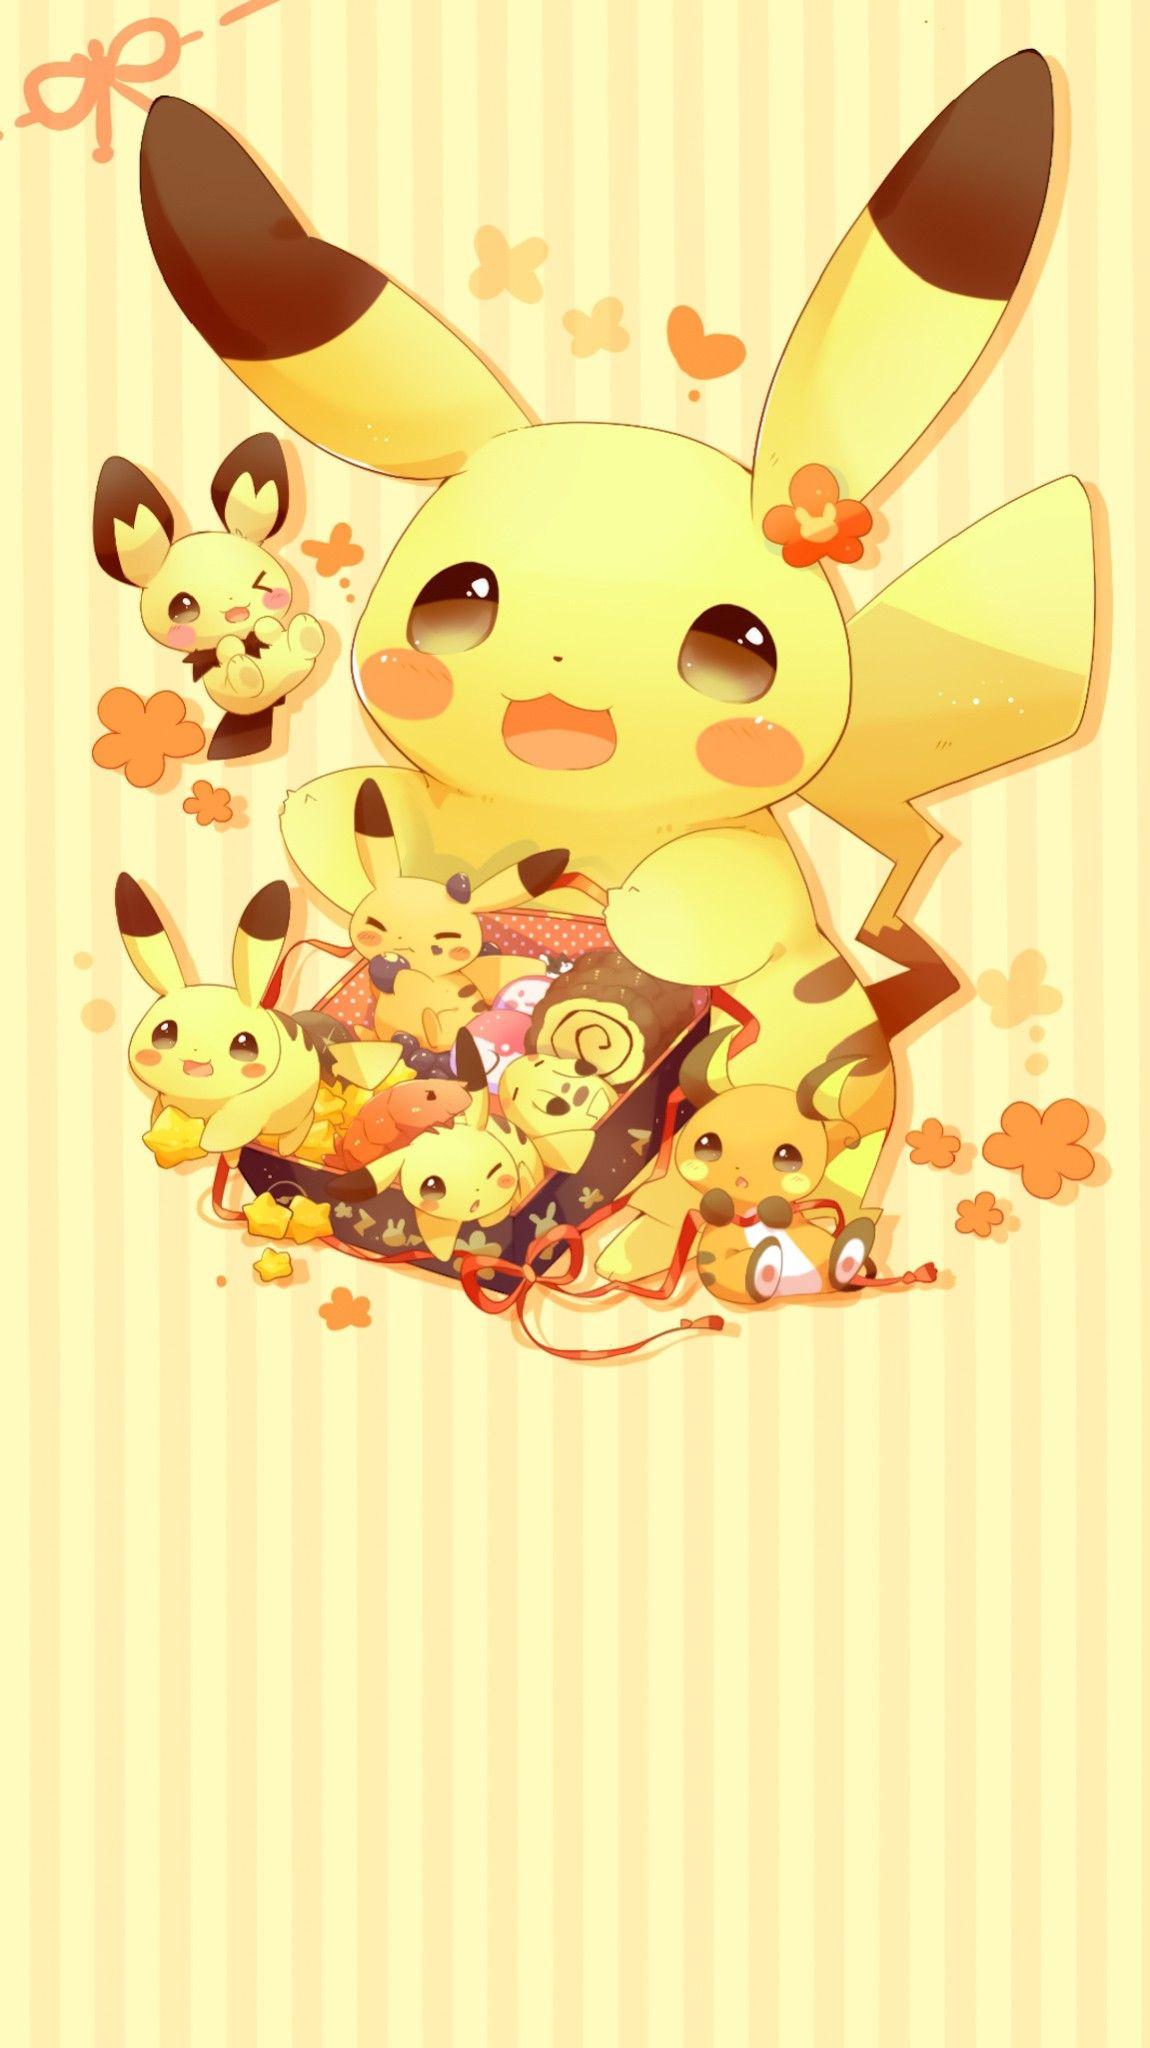 Pin By Aekkalisa On Pokemon Bg Pikachu Wallpaper Pikachu Art Pokemon Backgrounds